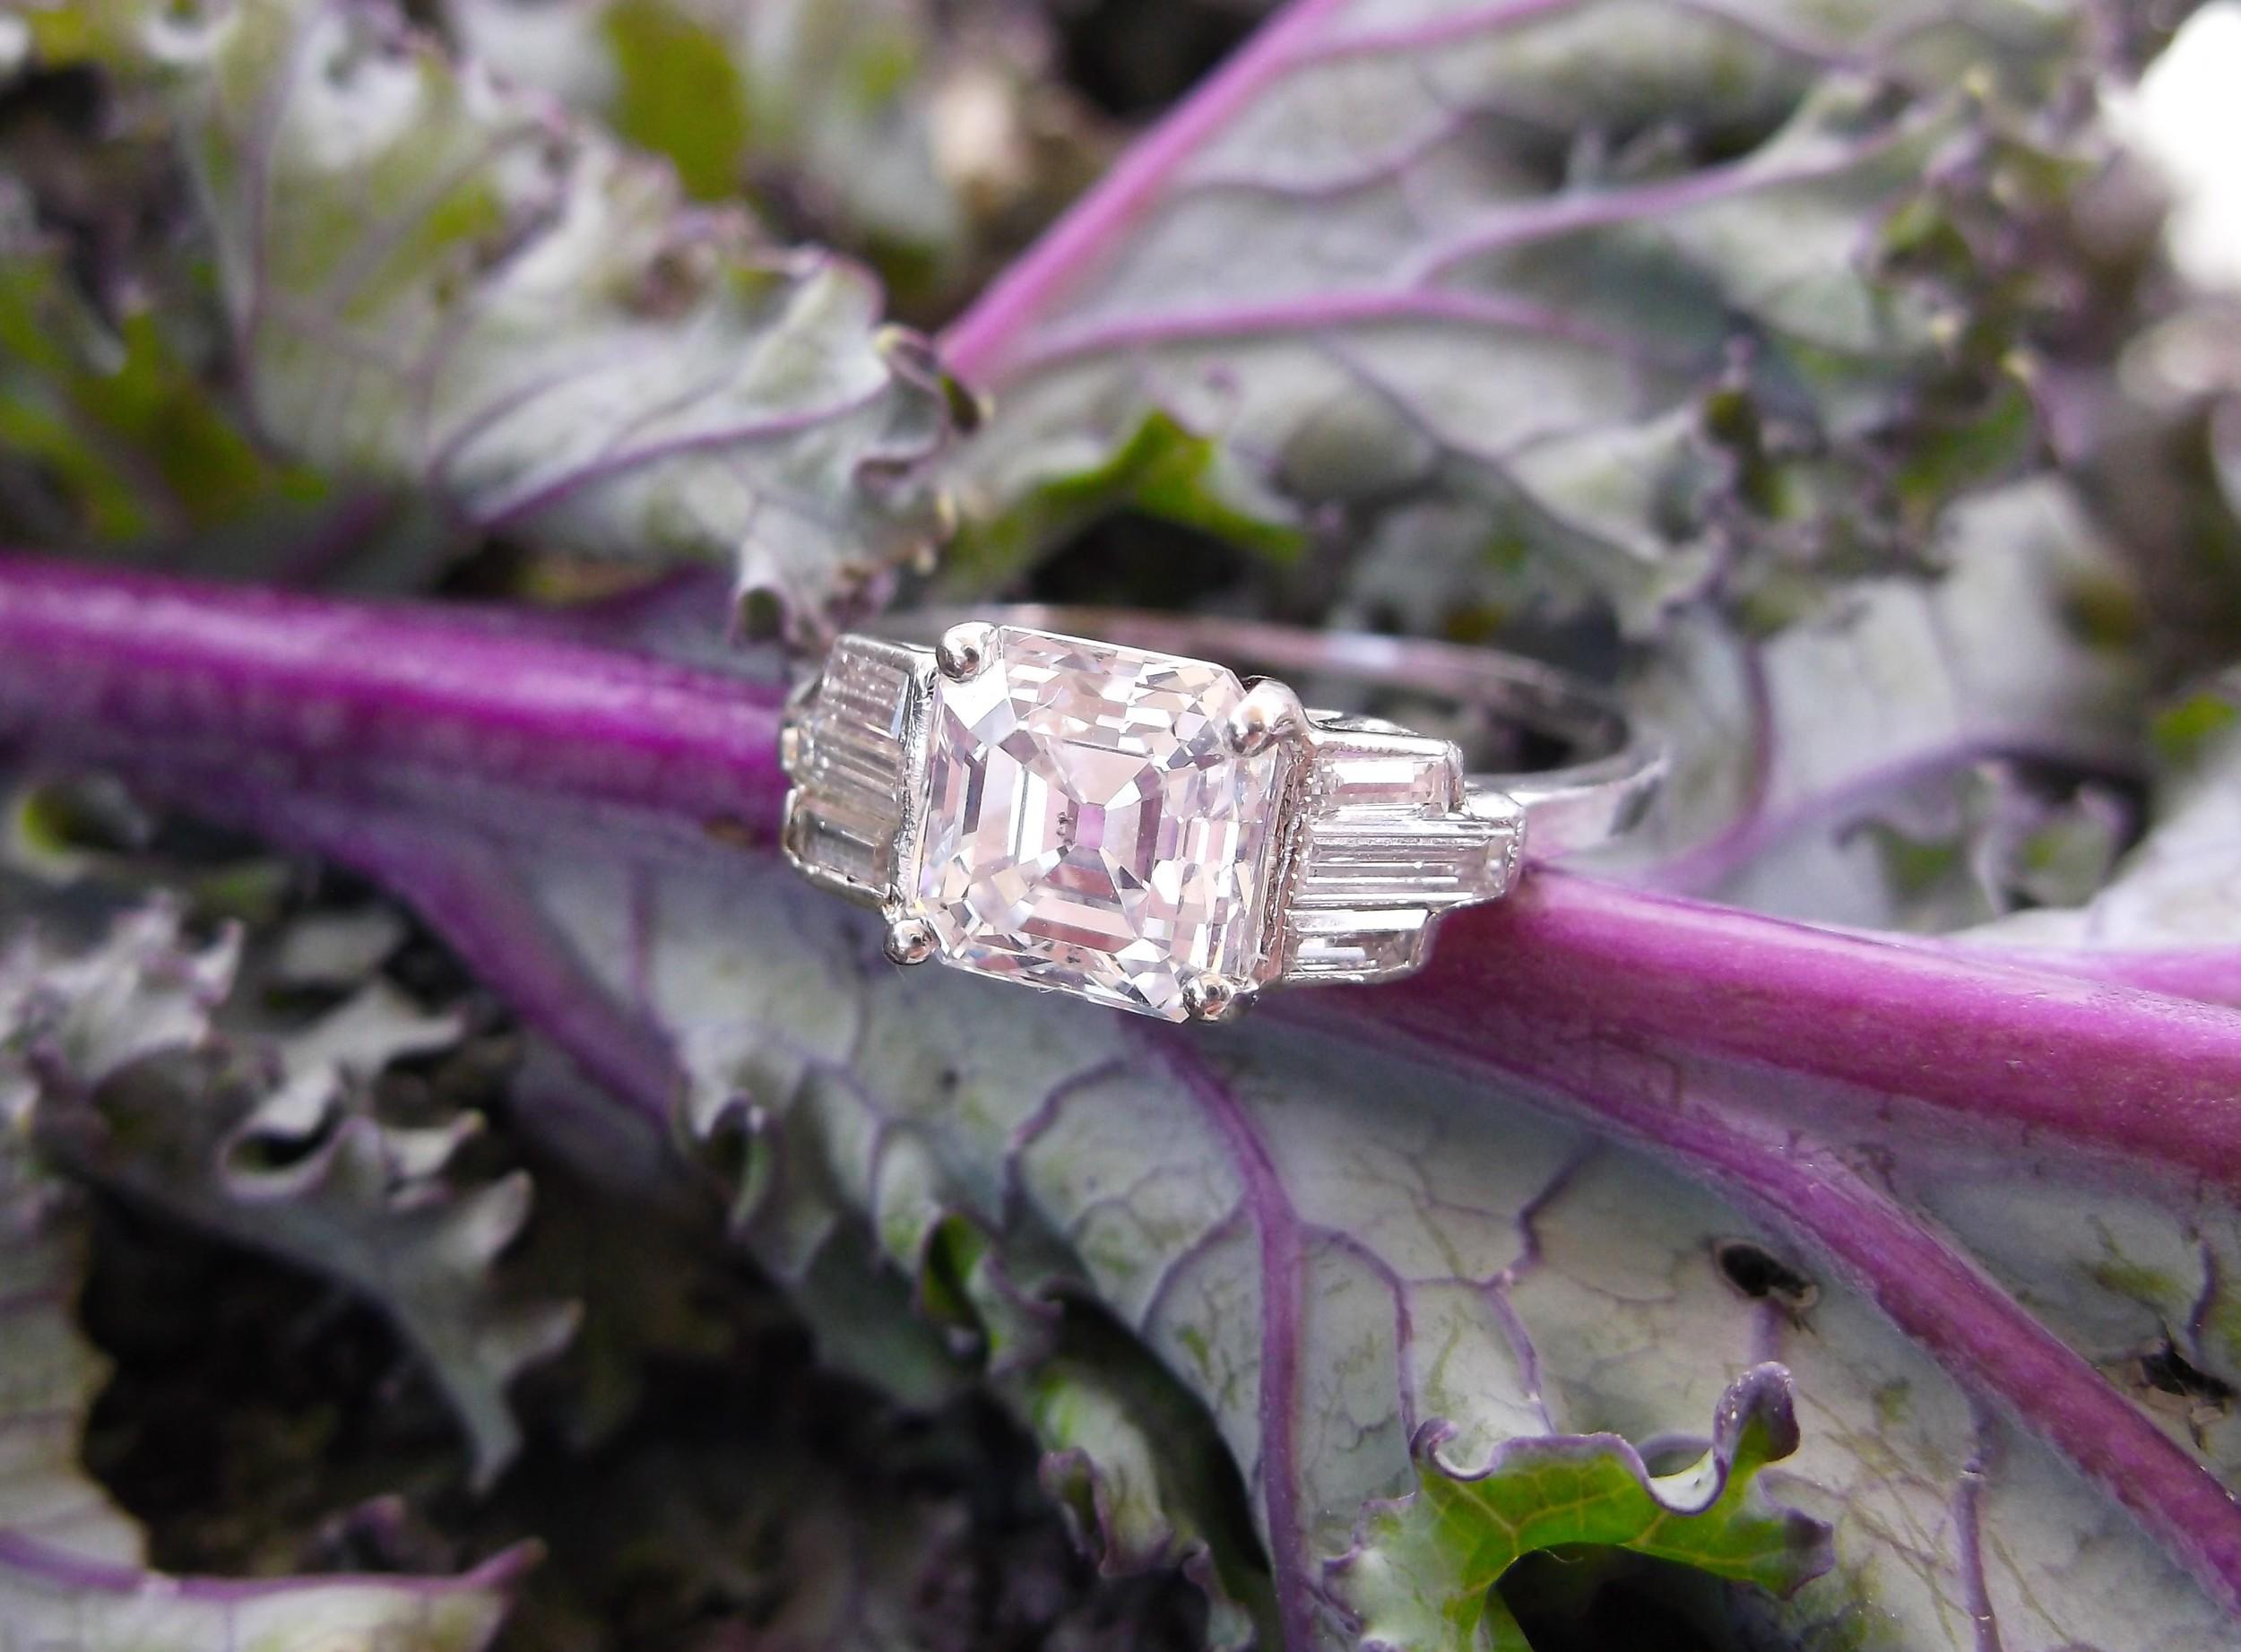 SOLD - Sophisticated Art Deco 1.13 carat asscher cut diamond, flanked by three baguette cut diamonds on each side.